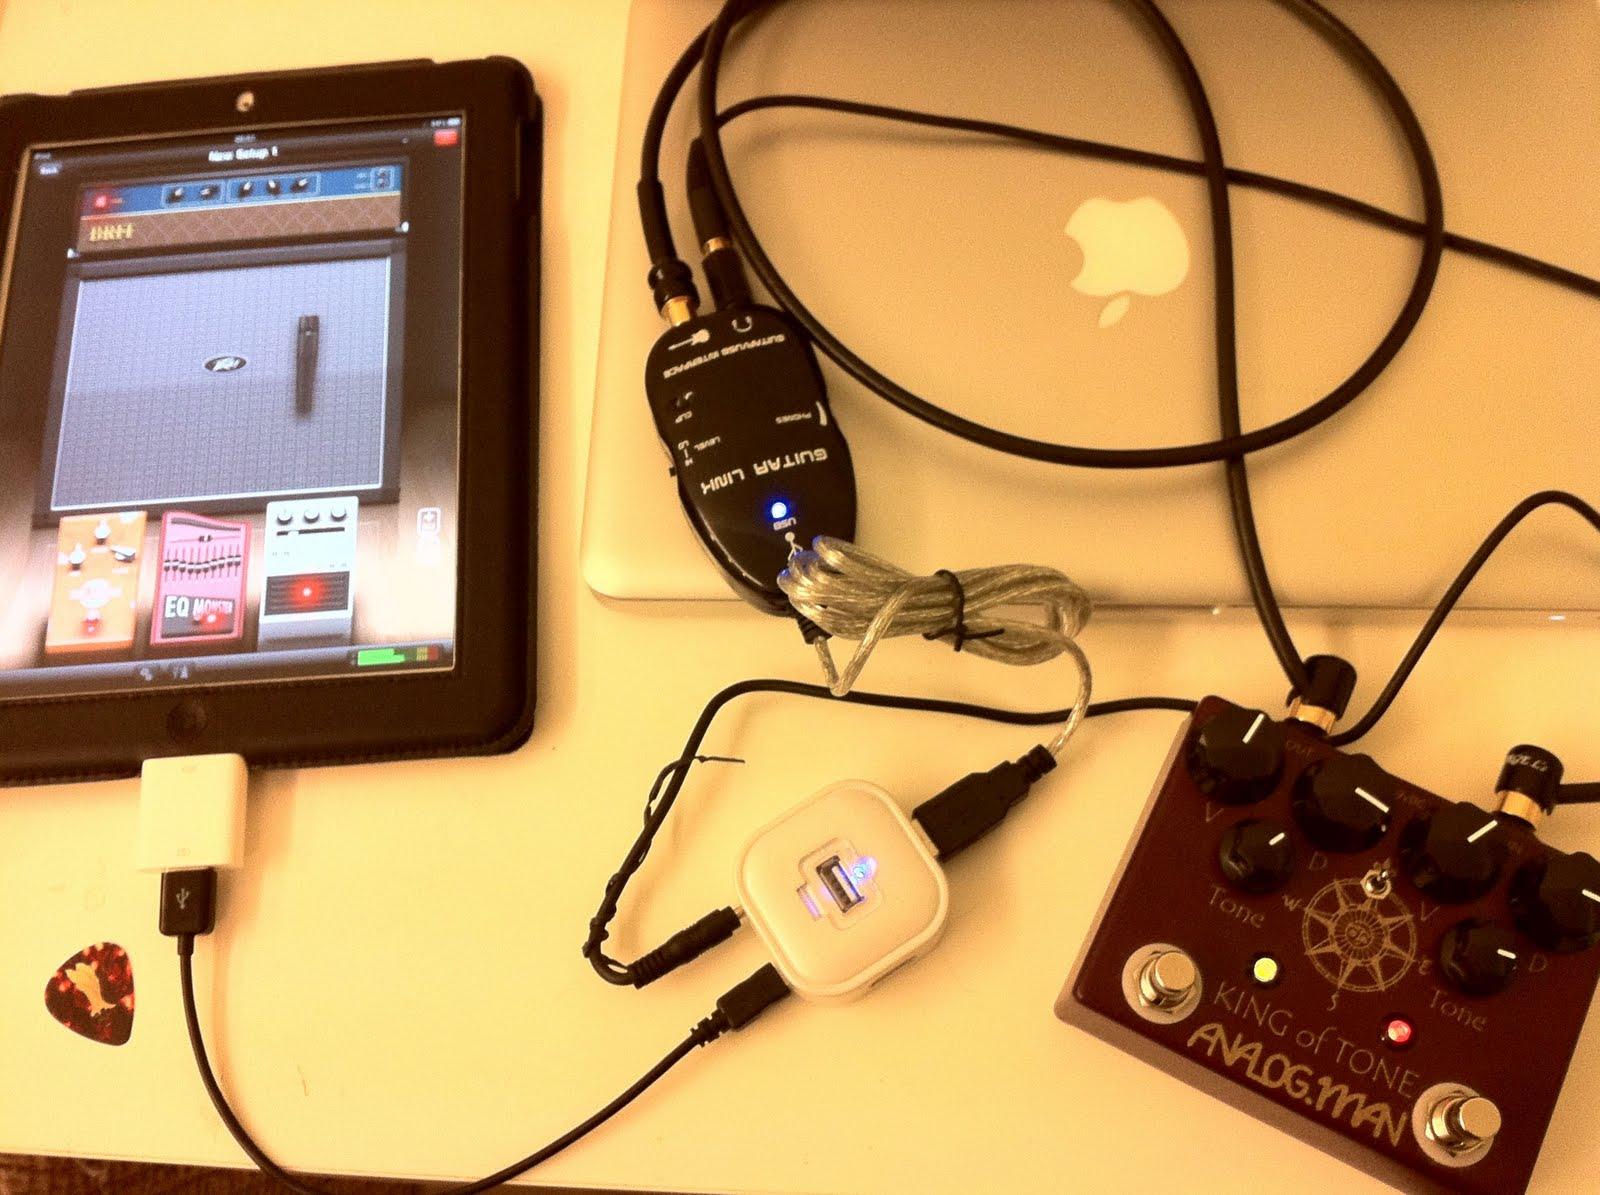 touchworshipper using ipad iphone as guitar processor. Black Bedroom Furniture Sets. Home Design Ideas